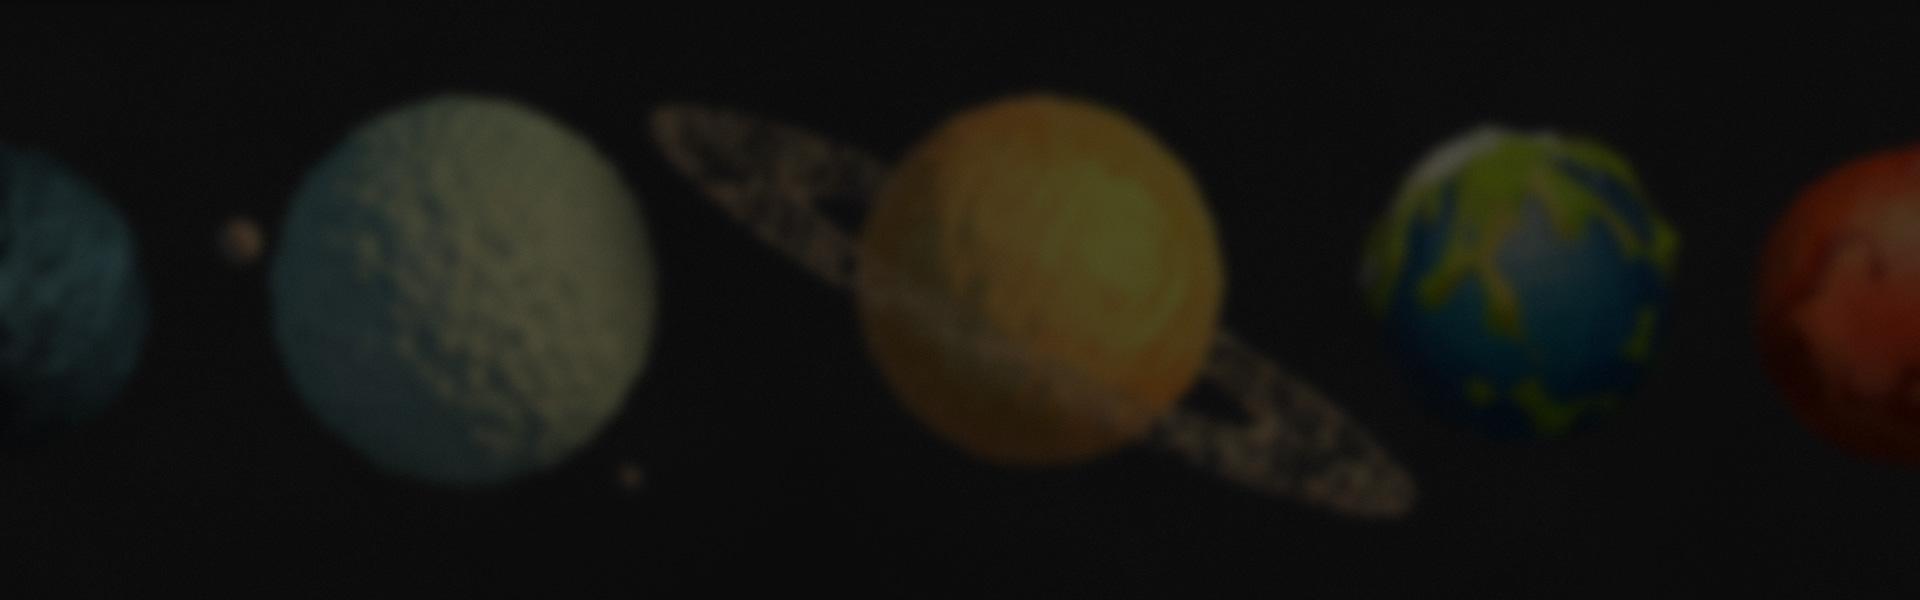 planets_header